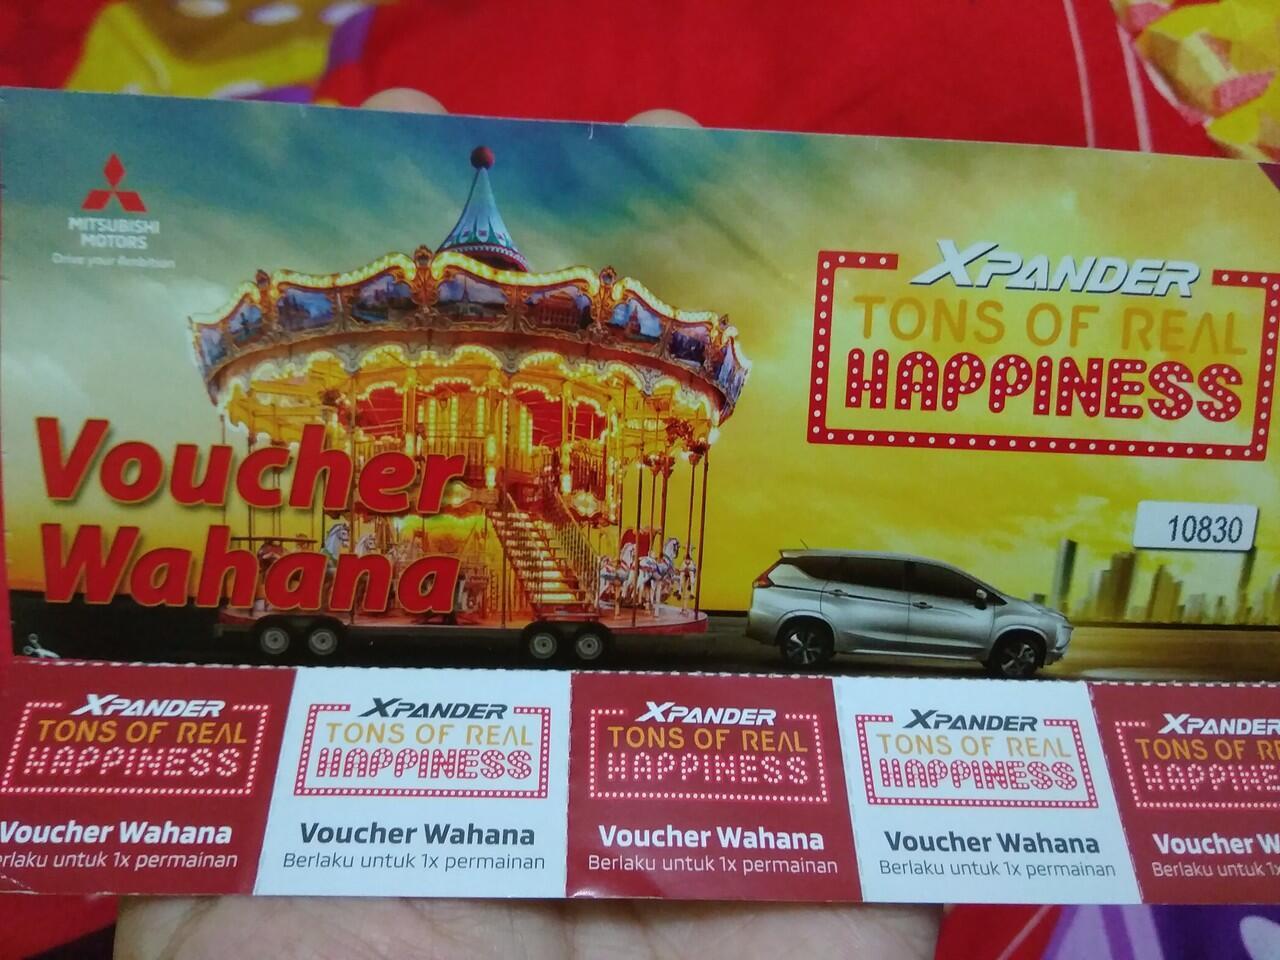 FR Keseruan Xpander Tons of Real Happiness Bersama RPM Kaskus